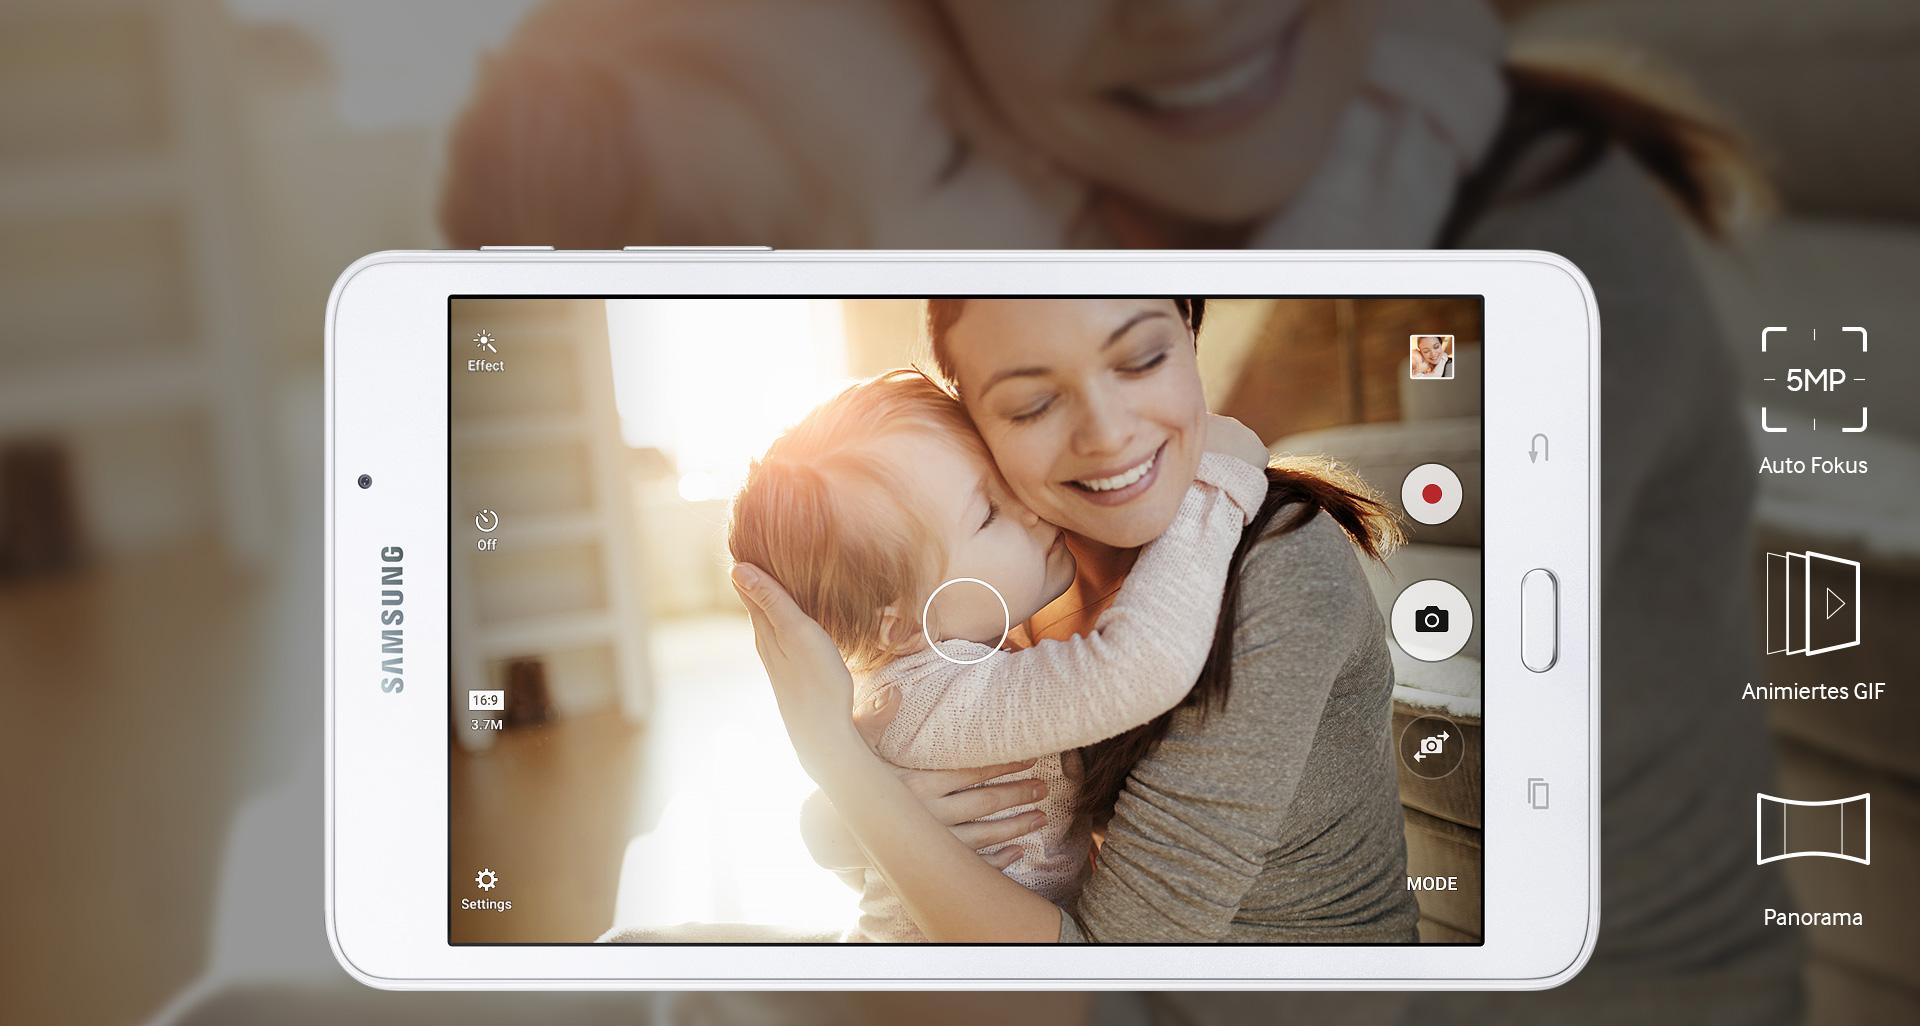 ... Tempered Glass Screen Protector . Source · Harga Samsung Galaxy Tab E 96 Sm T560 8gb Wifi White Tablet Dwi Aiueo A 70